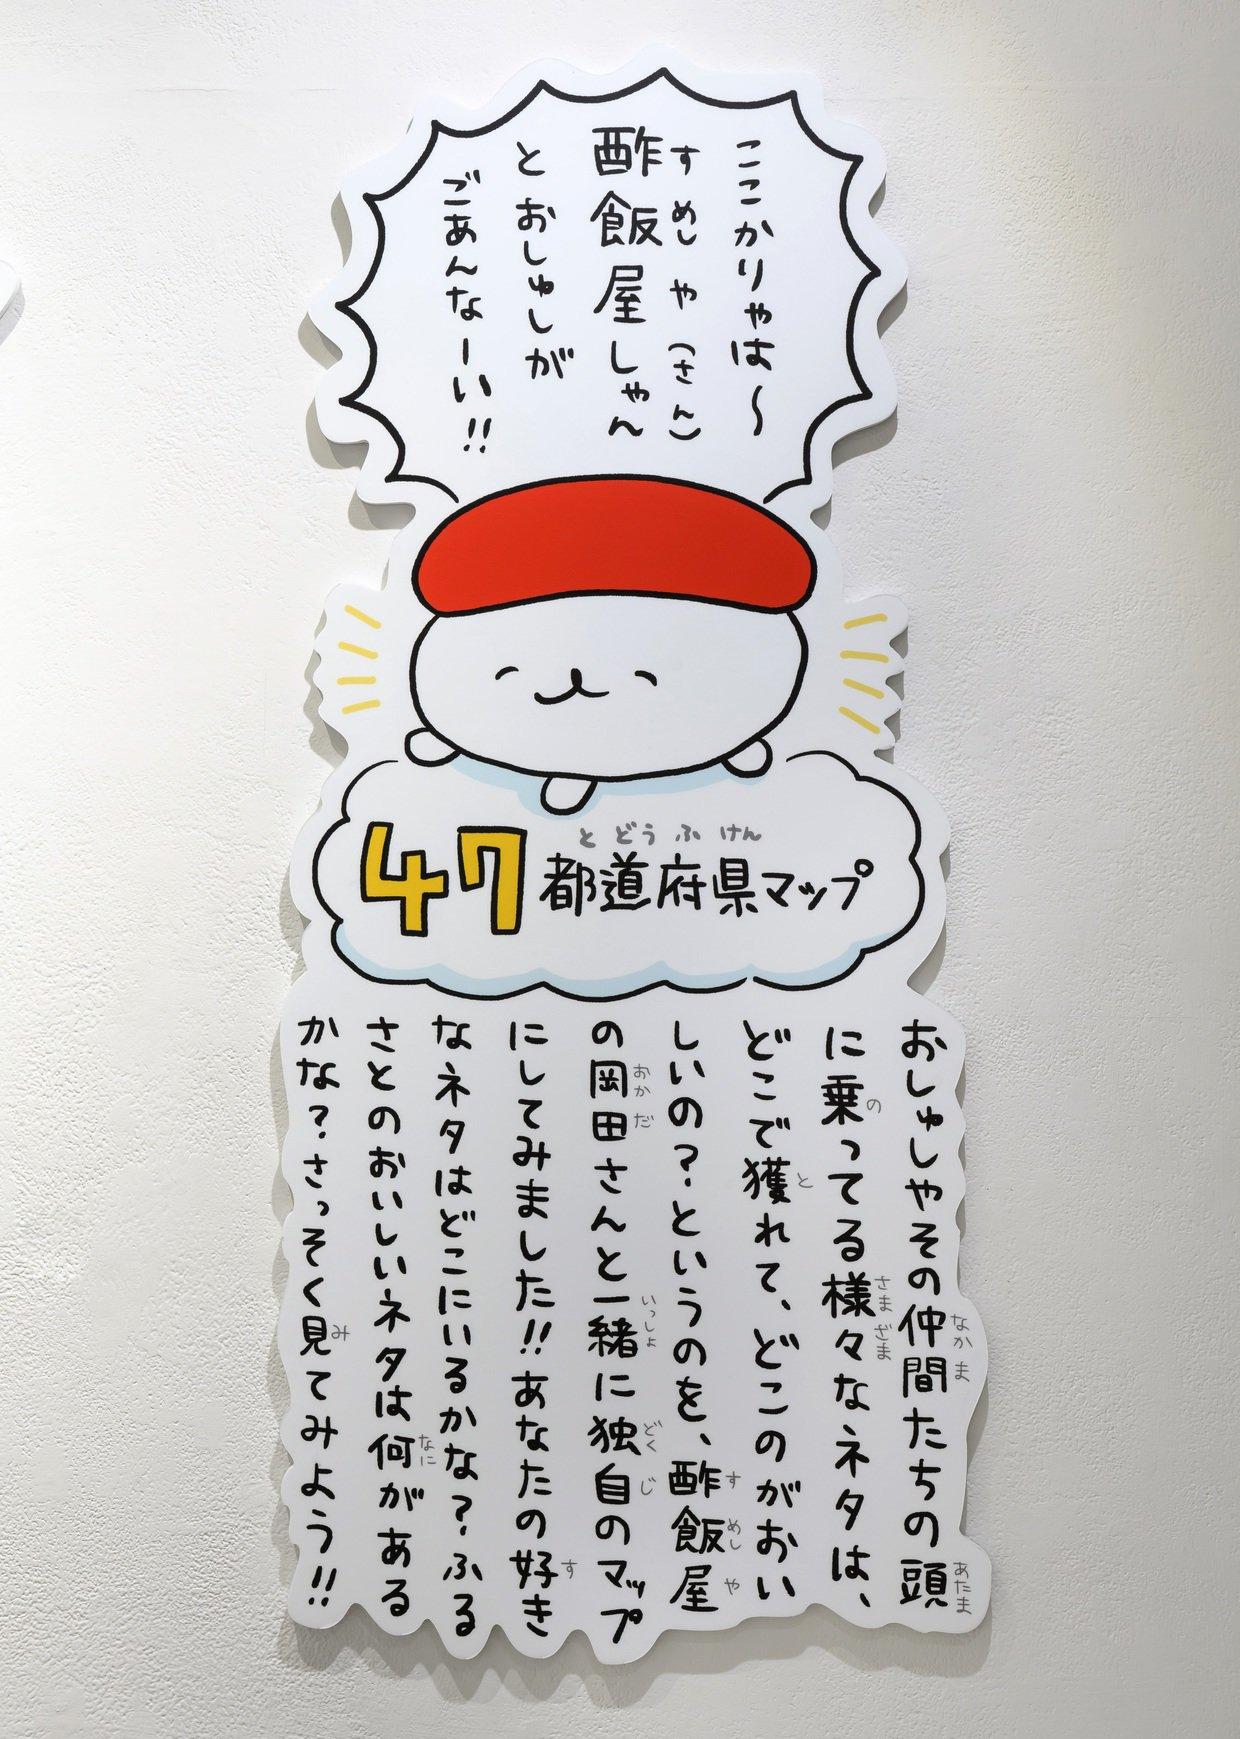 O_029.jpg